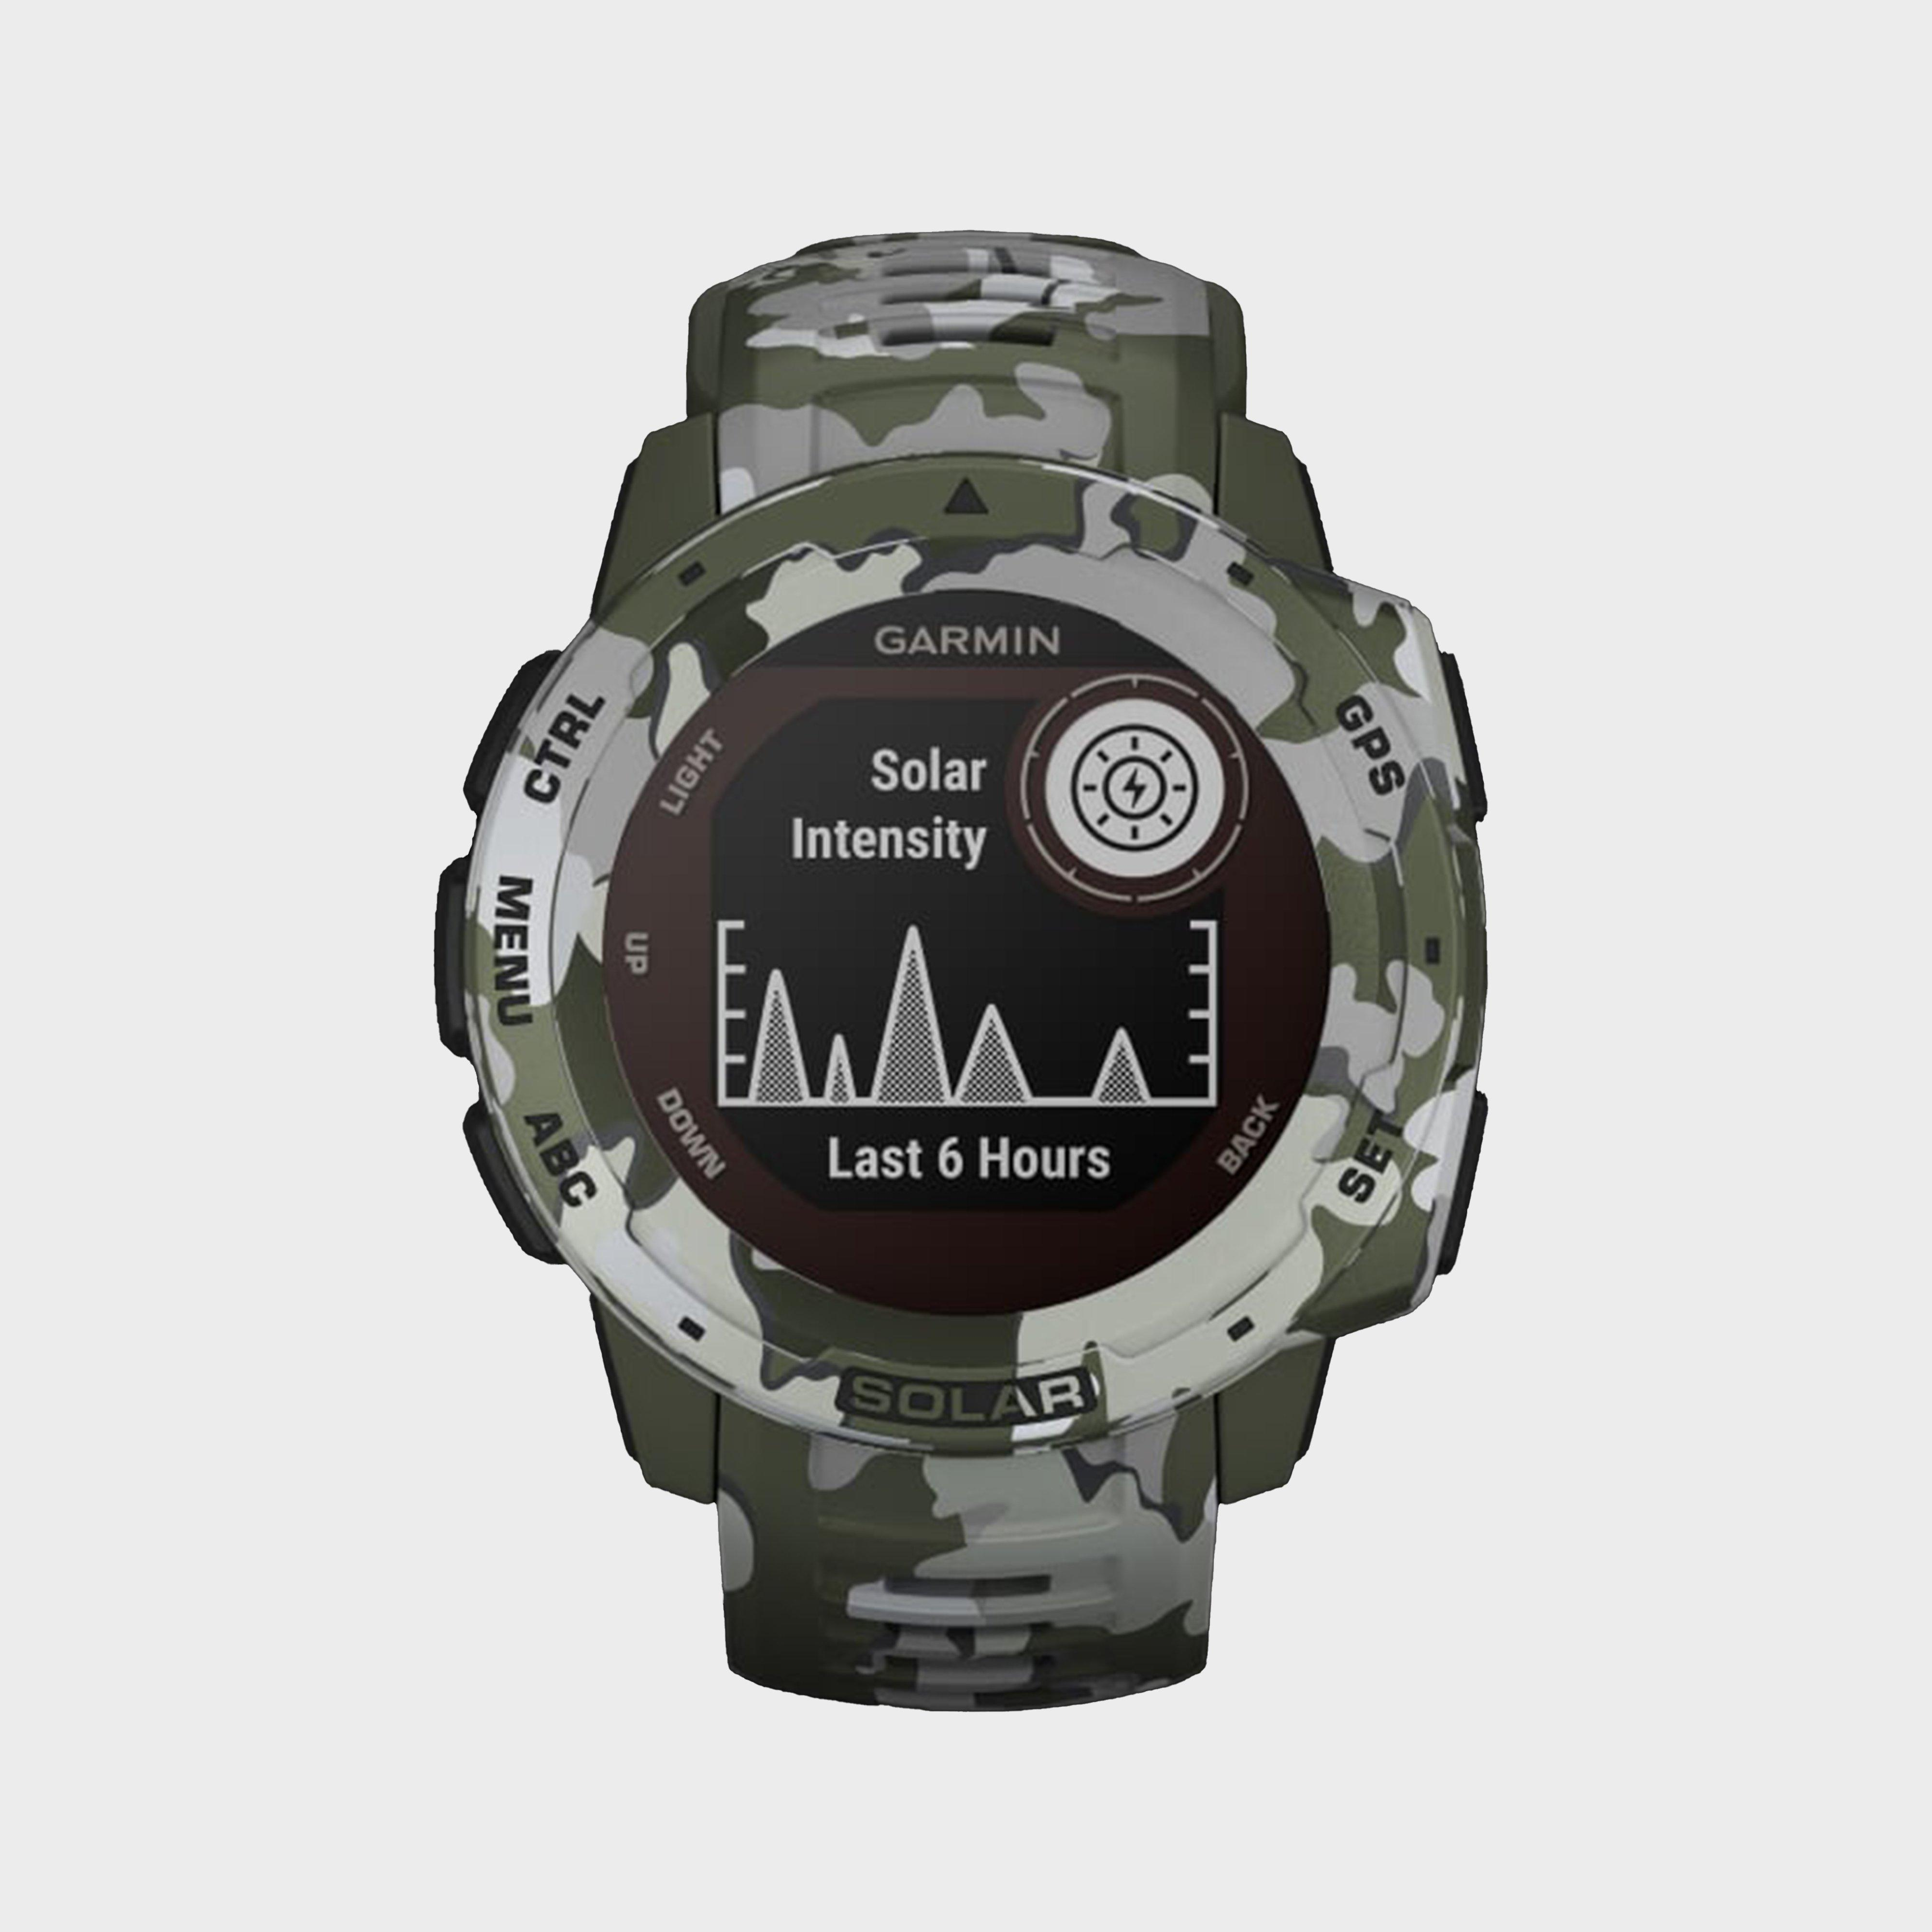 Garmin Instinct Solar Edition Multi-Sport Gps Watch - Multi/Green, Multi/Green